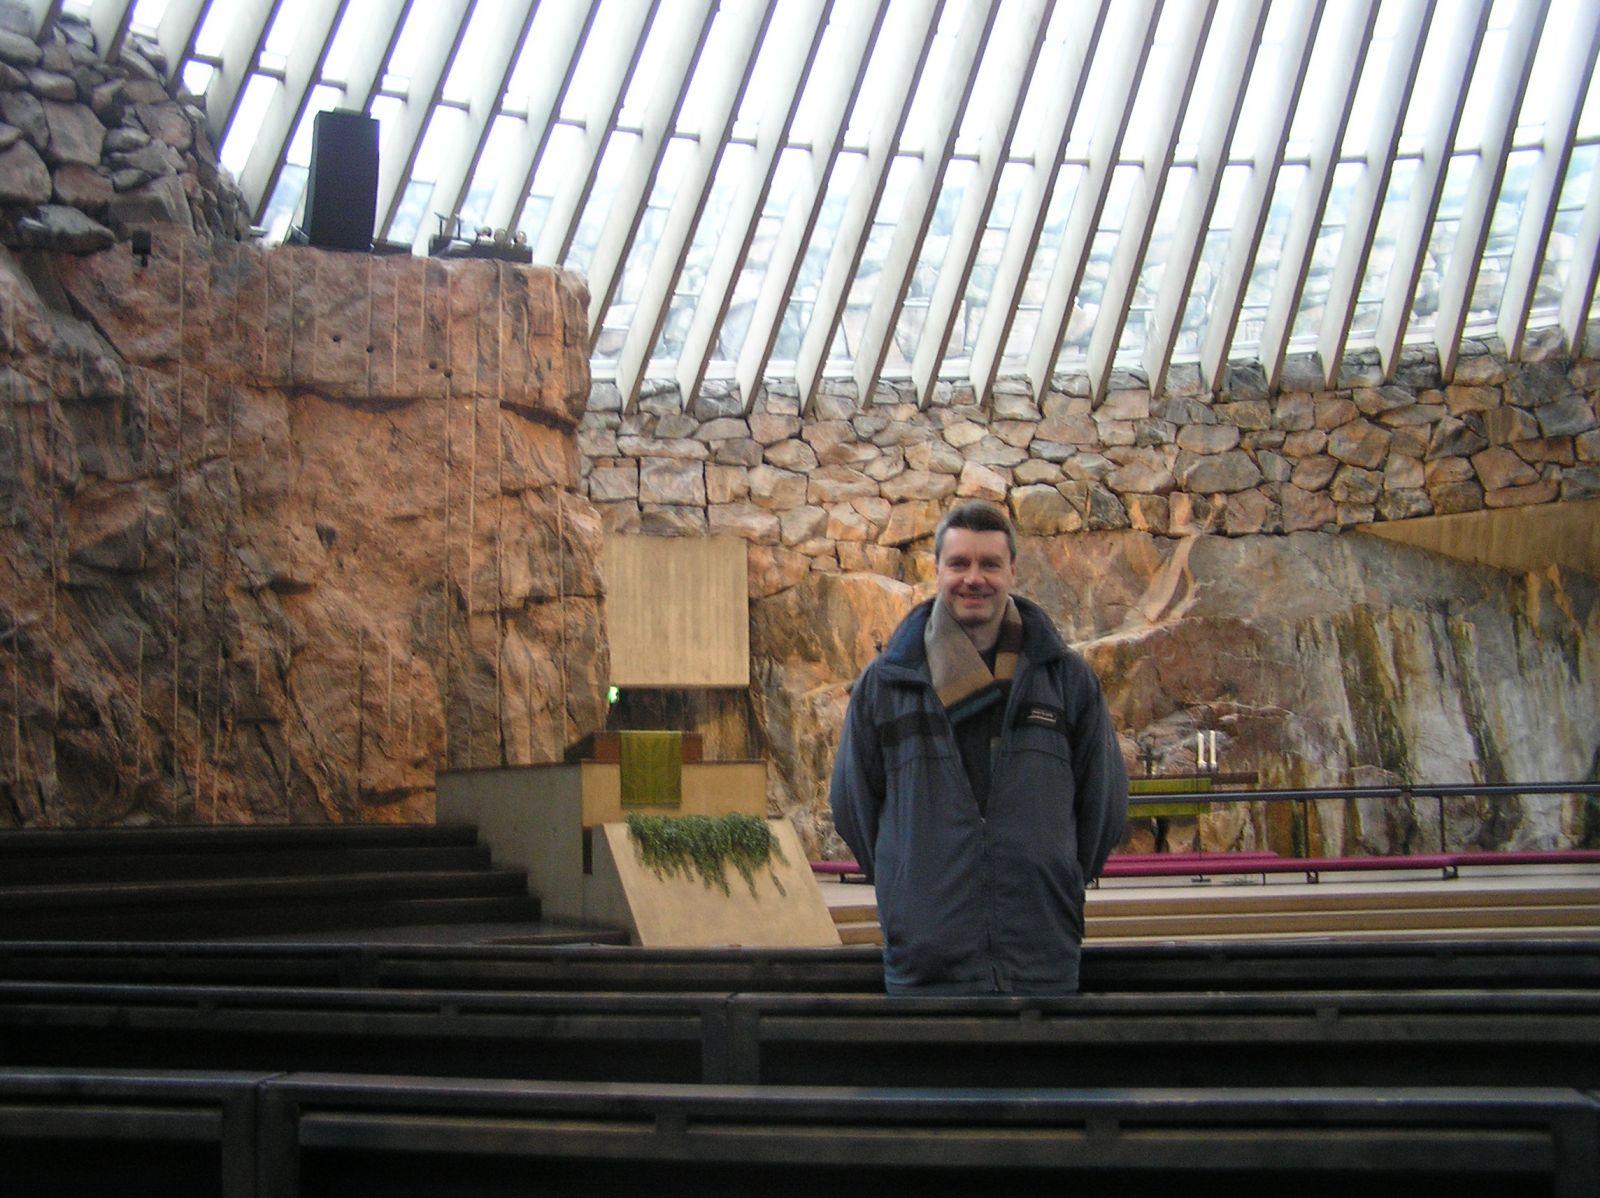 02.11.2013. Хельсинки